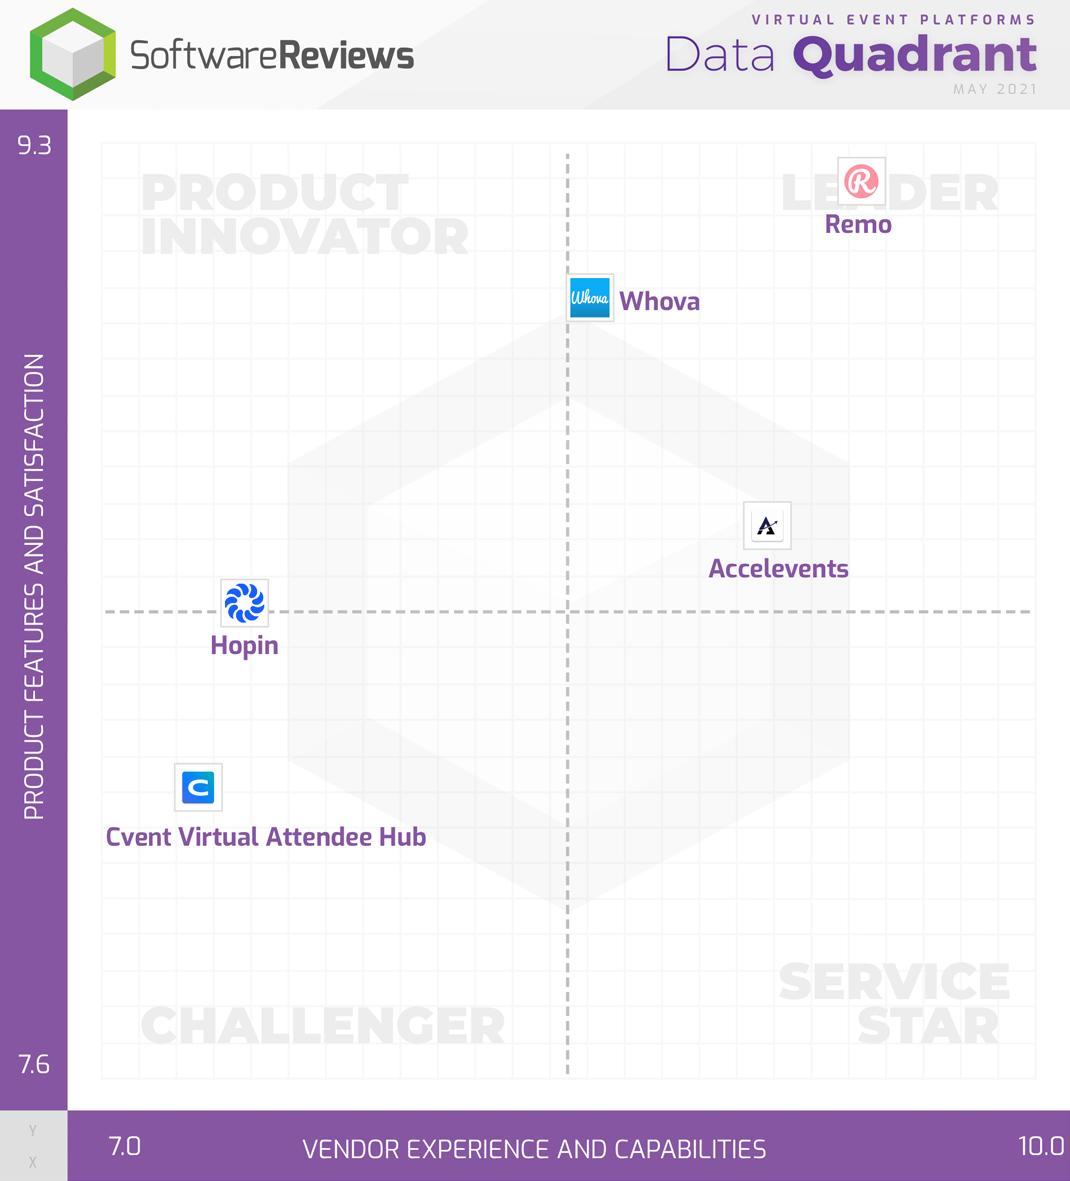 Virtual Event Platforms Data Quadrant